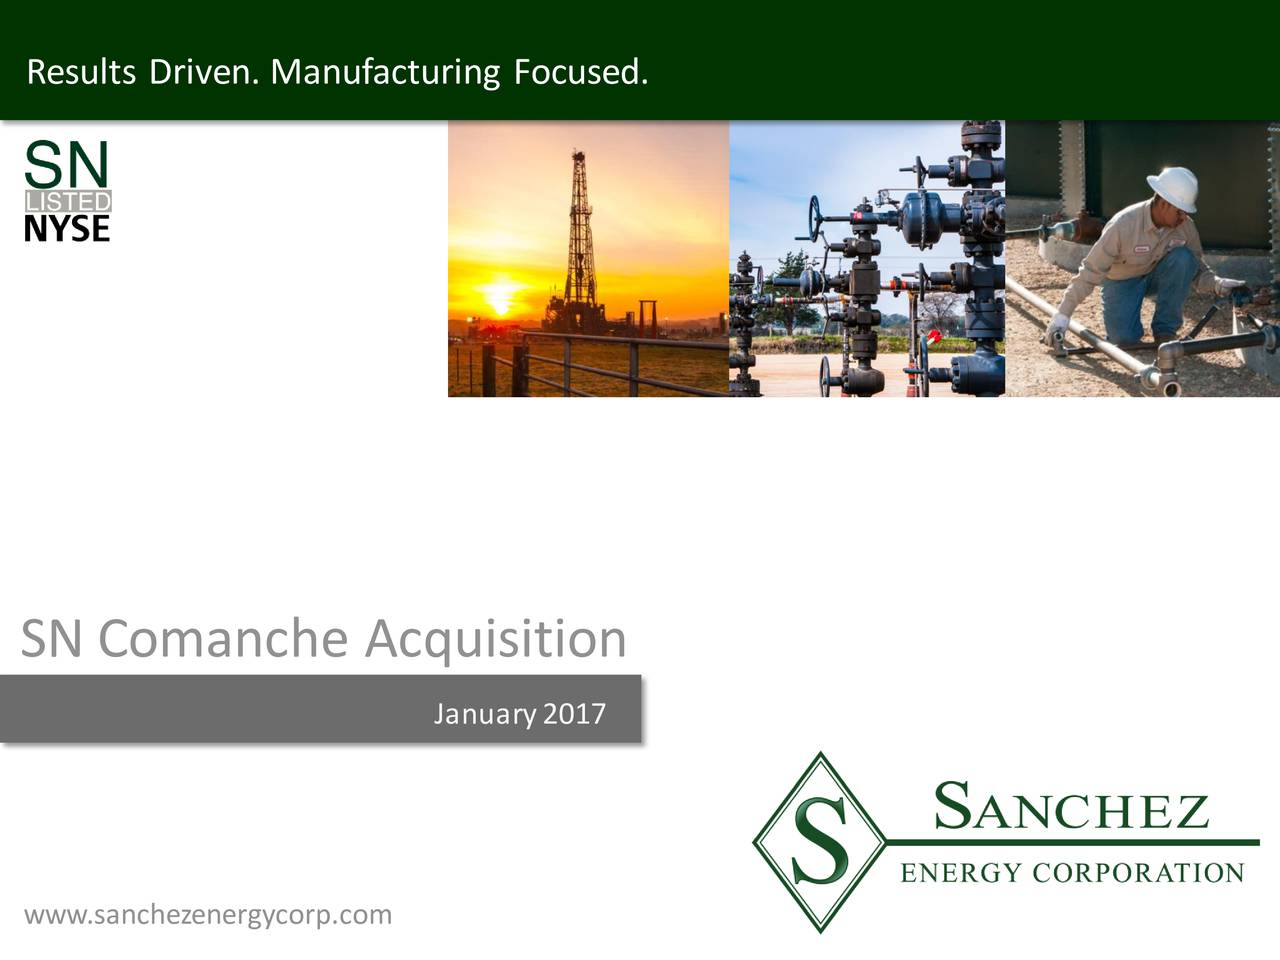 SN Comanche Acquisition January2017 January 23, 2017 www.sanchezenergycorp.com